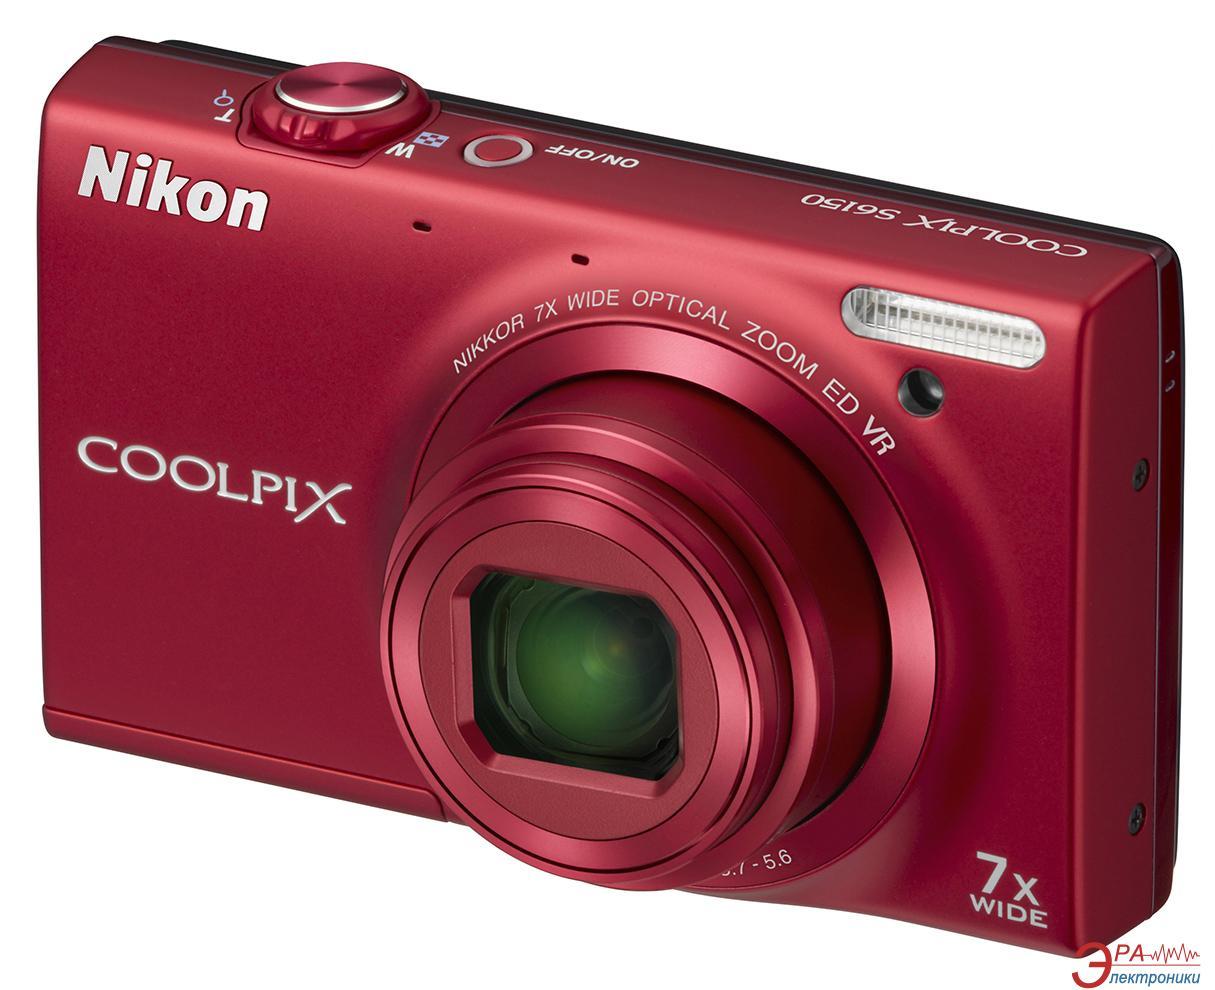 Цифровой фотоаппарат Nikon COOLPIX S6150 Red